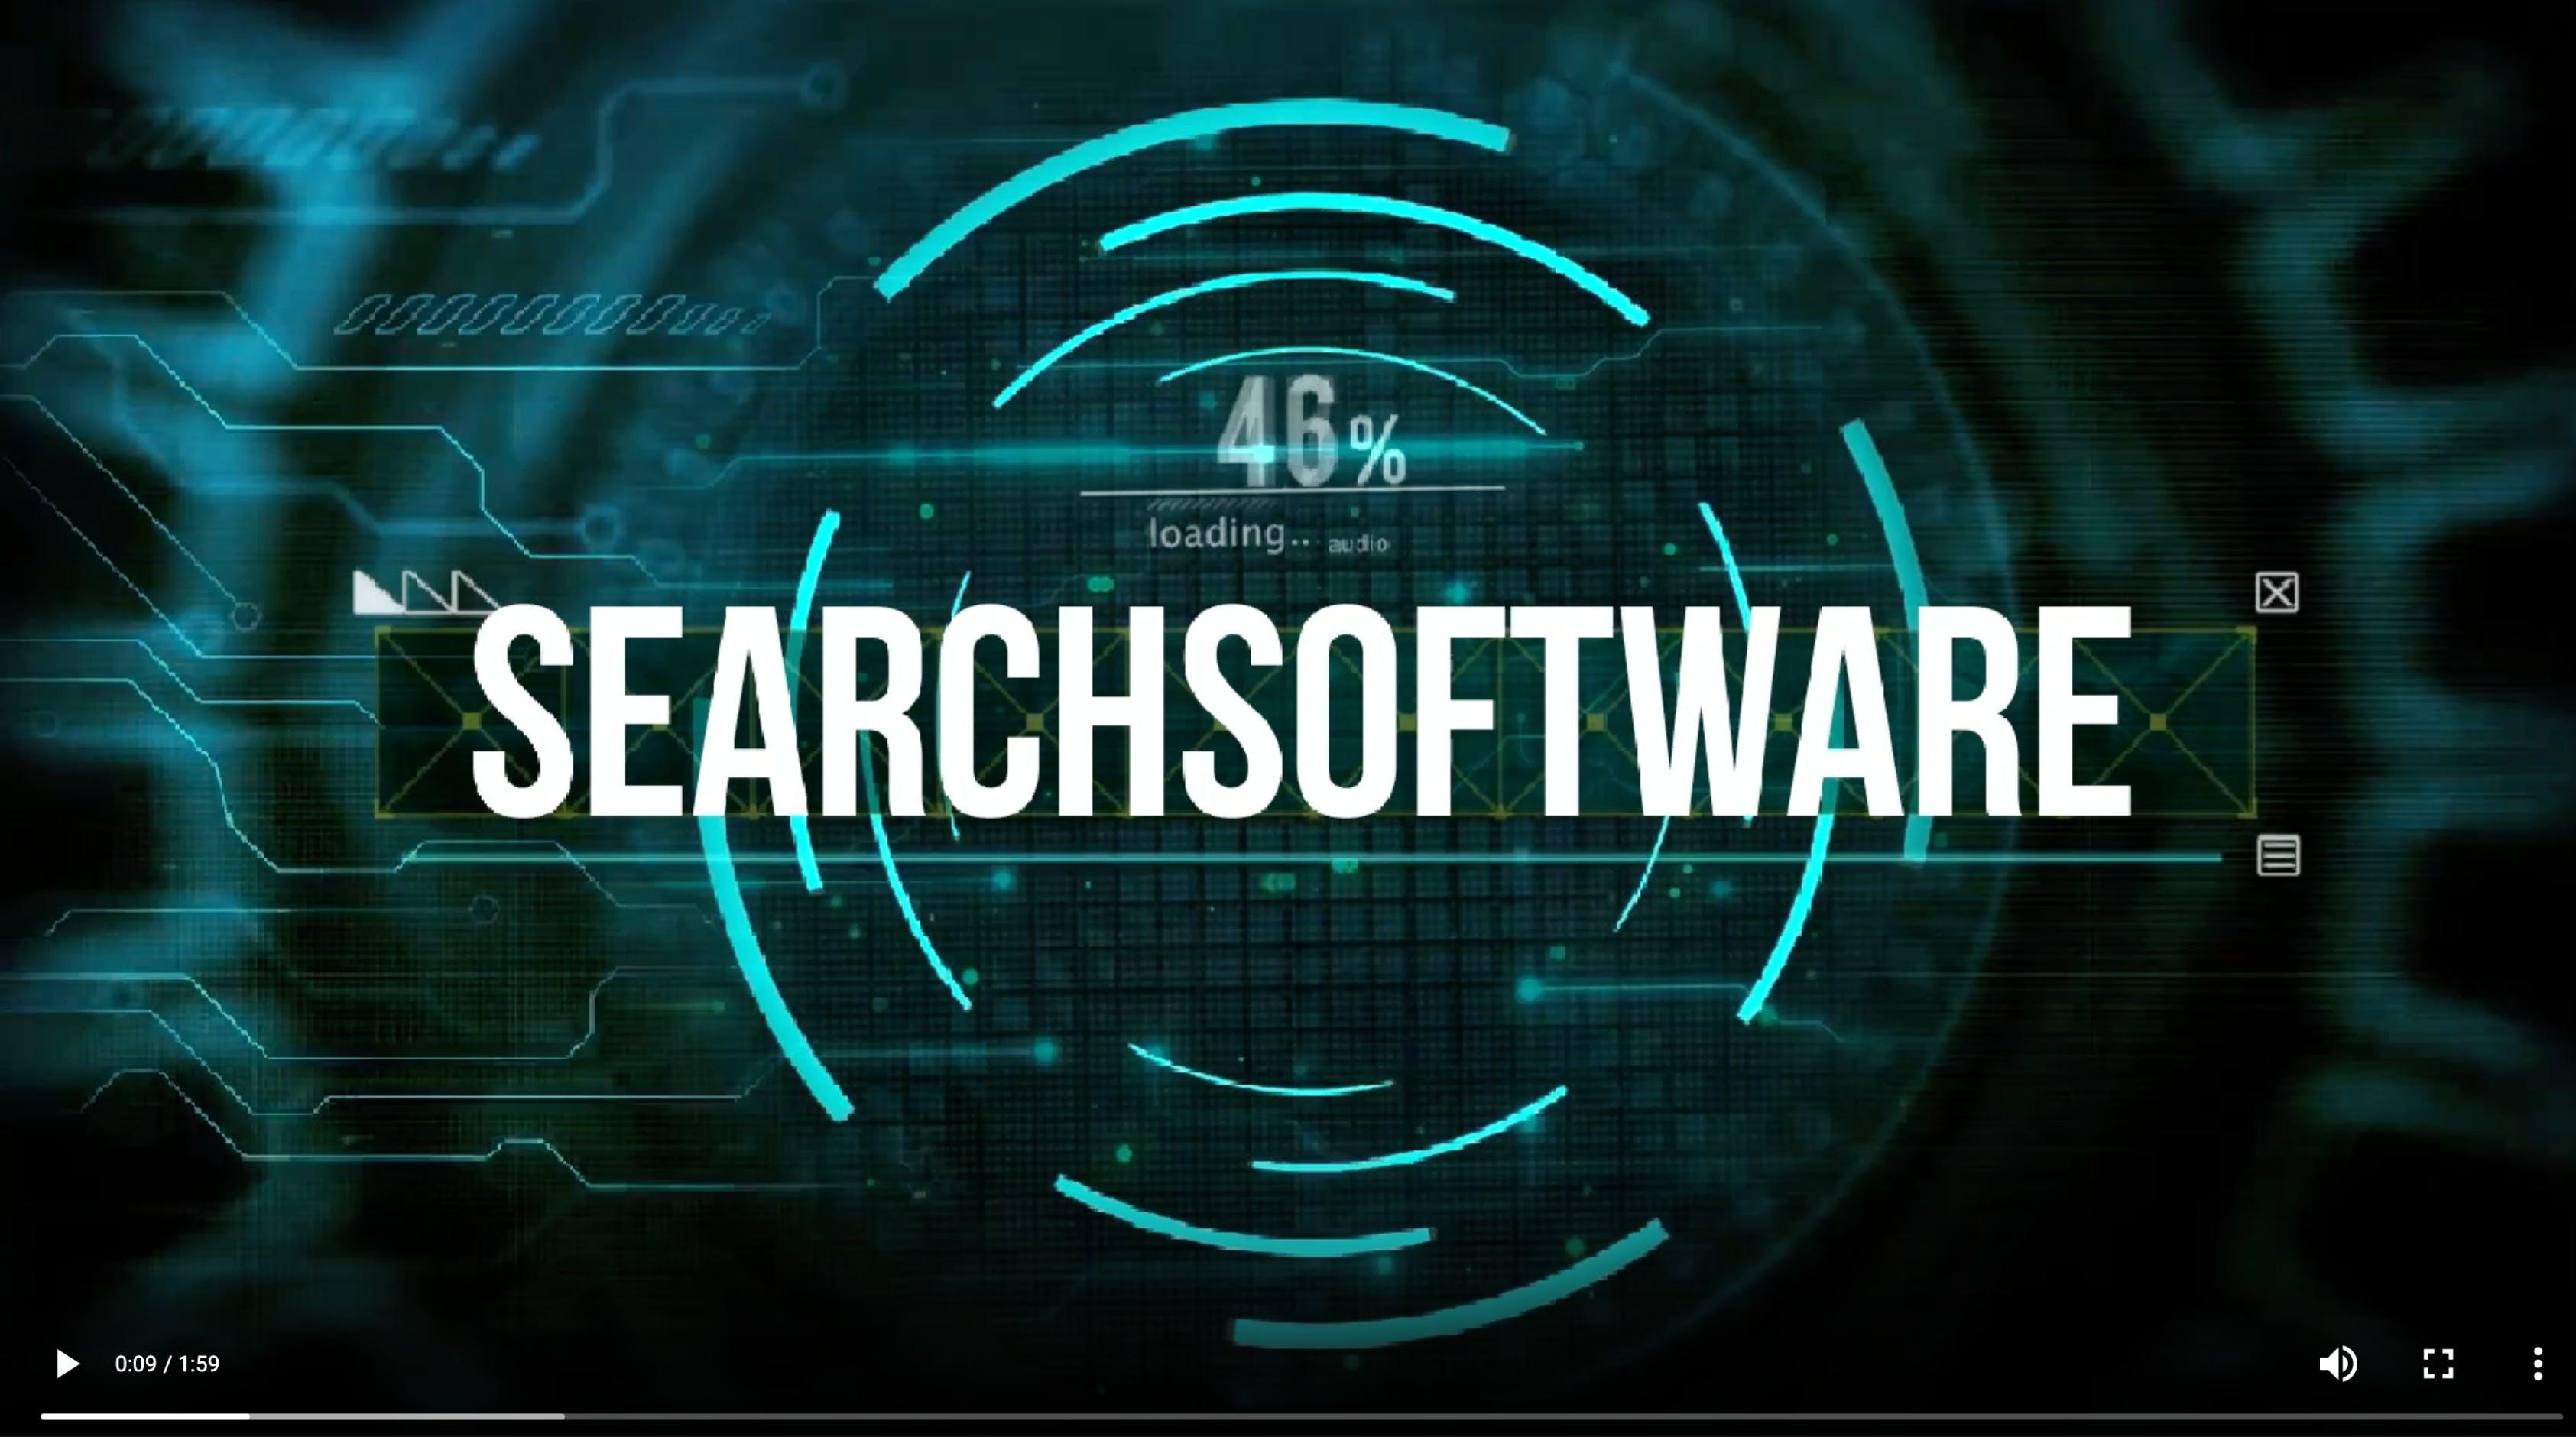 Searchsoftware Slack